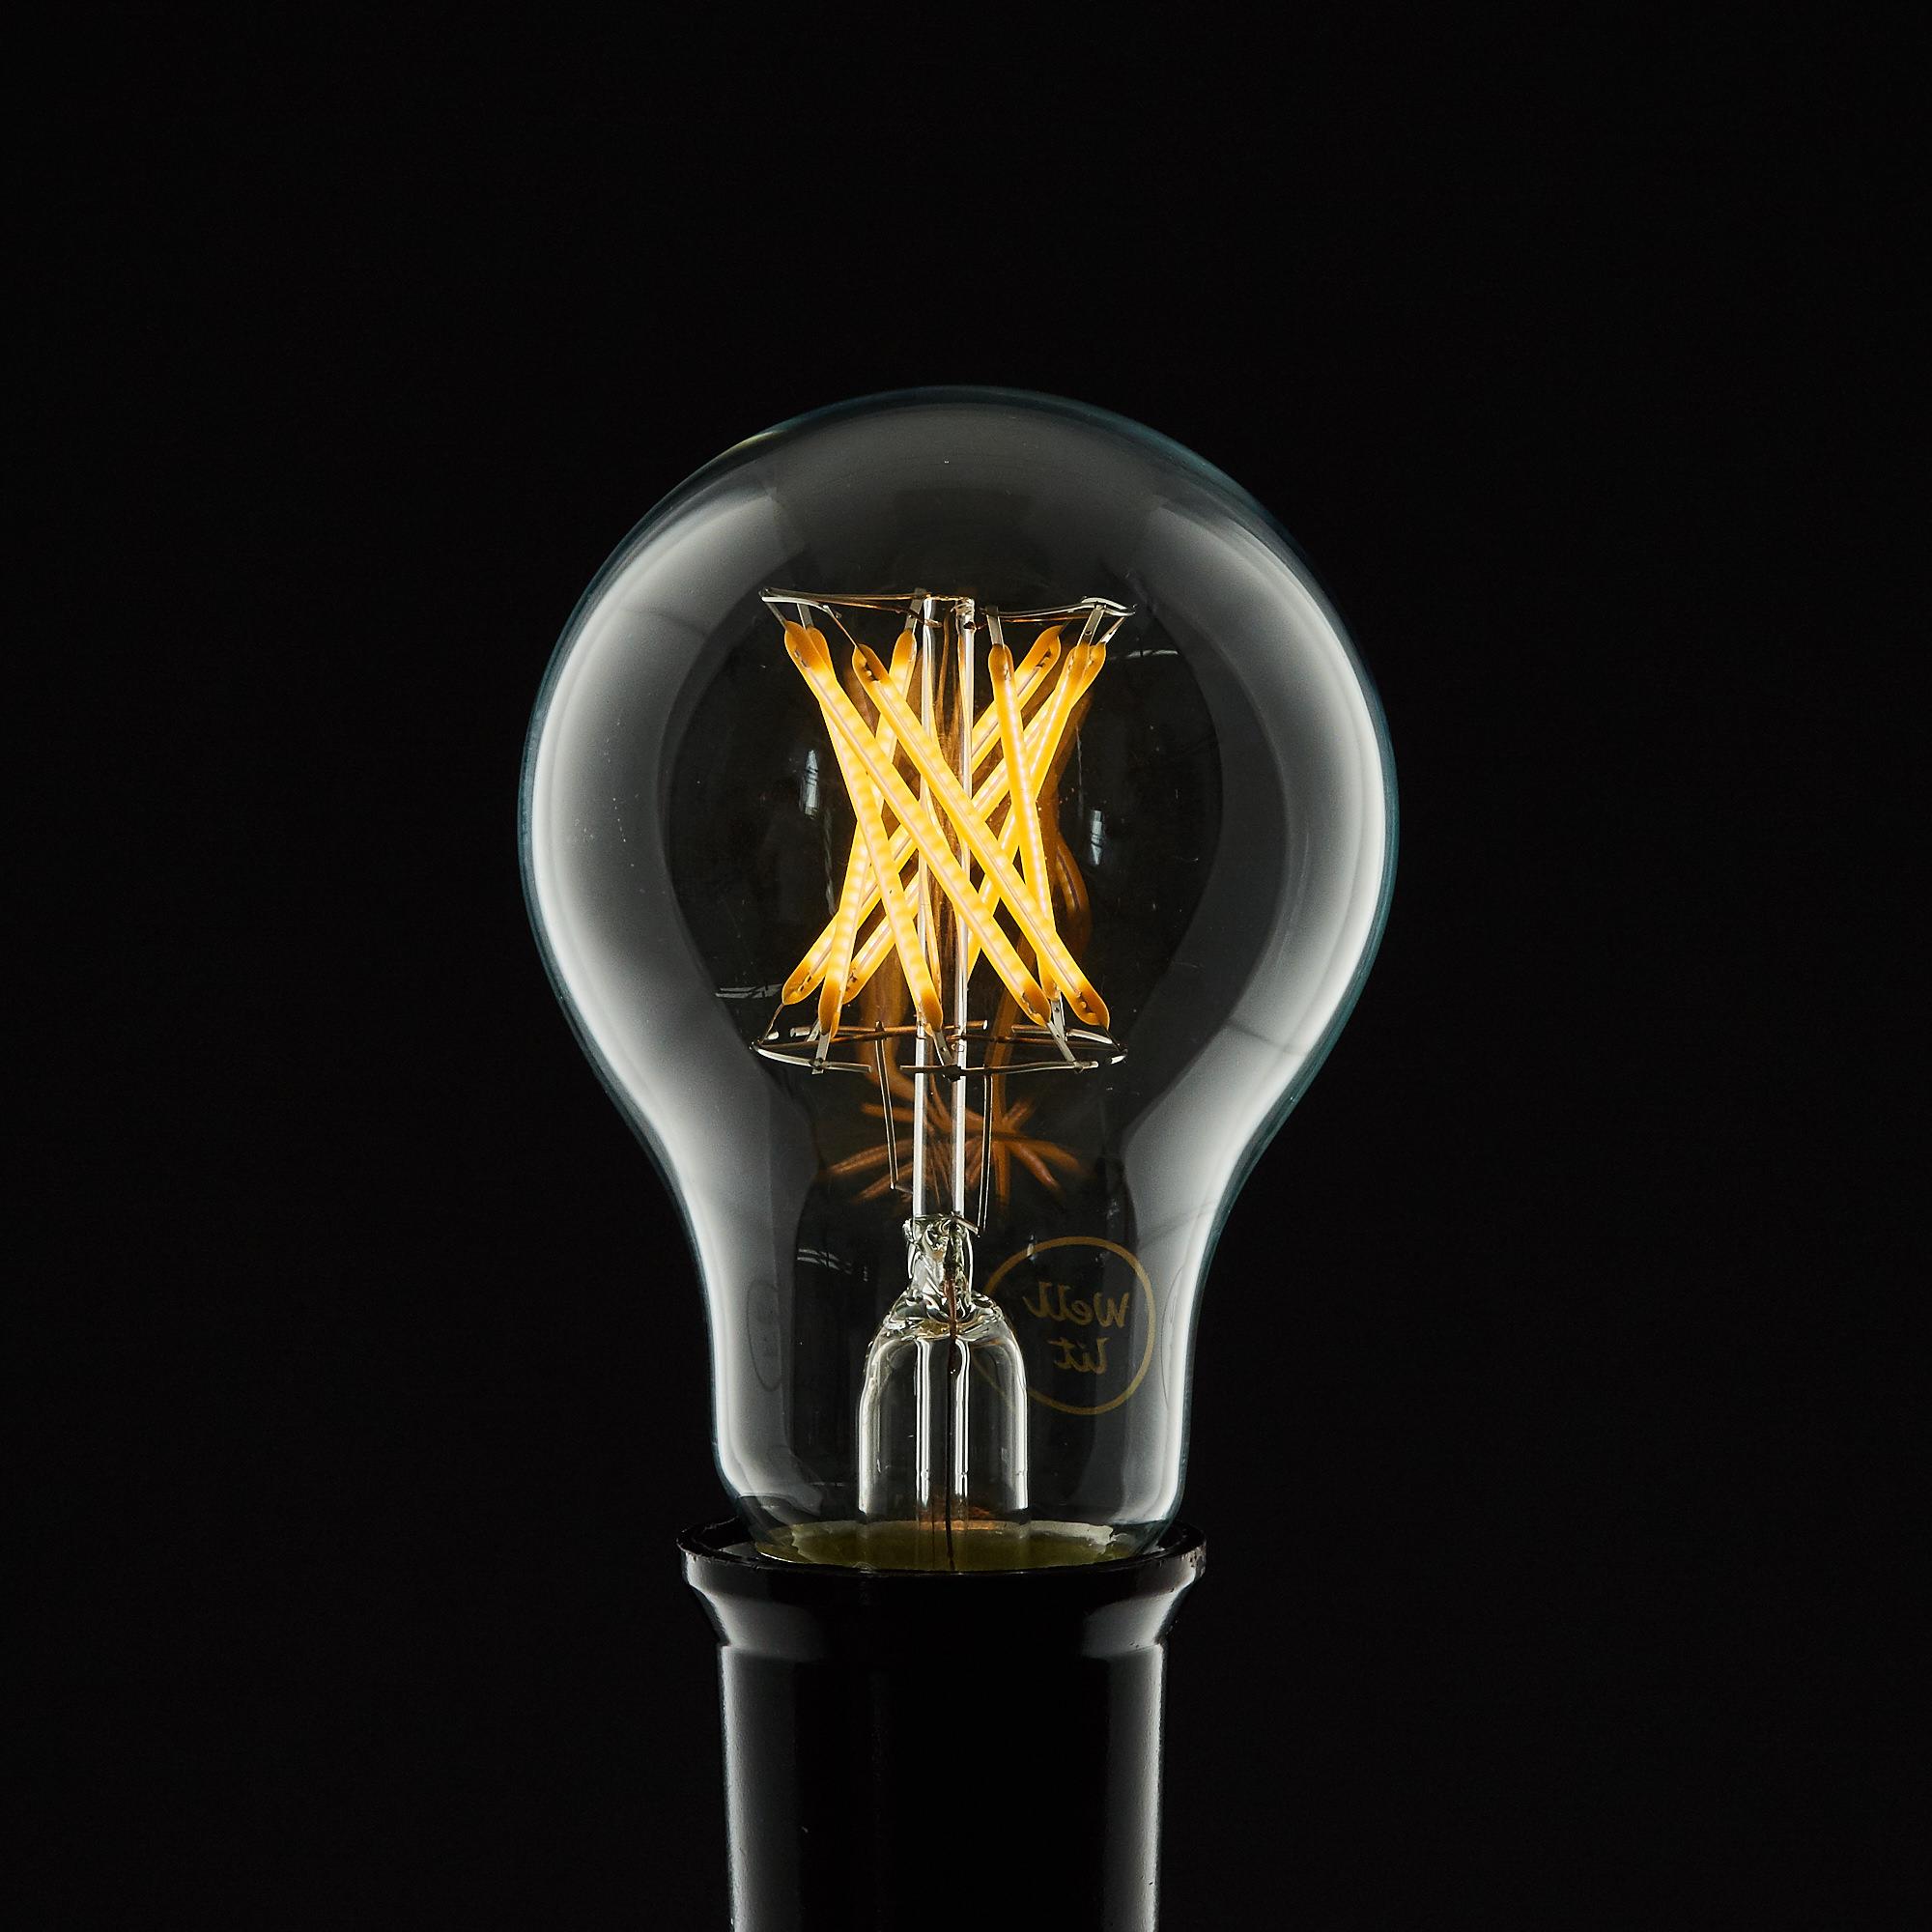 Filament bulb photo